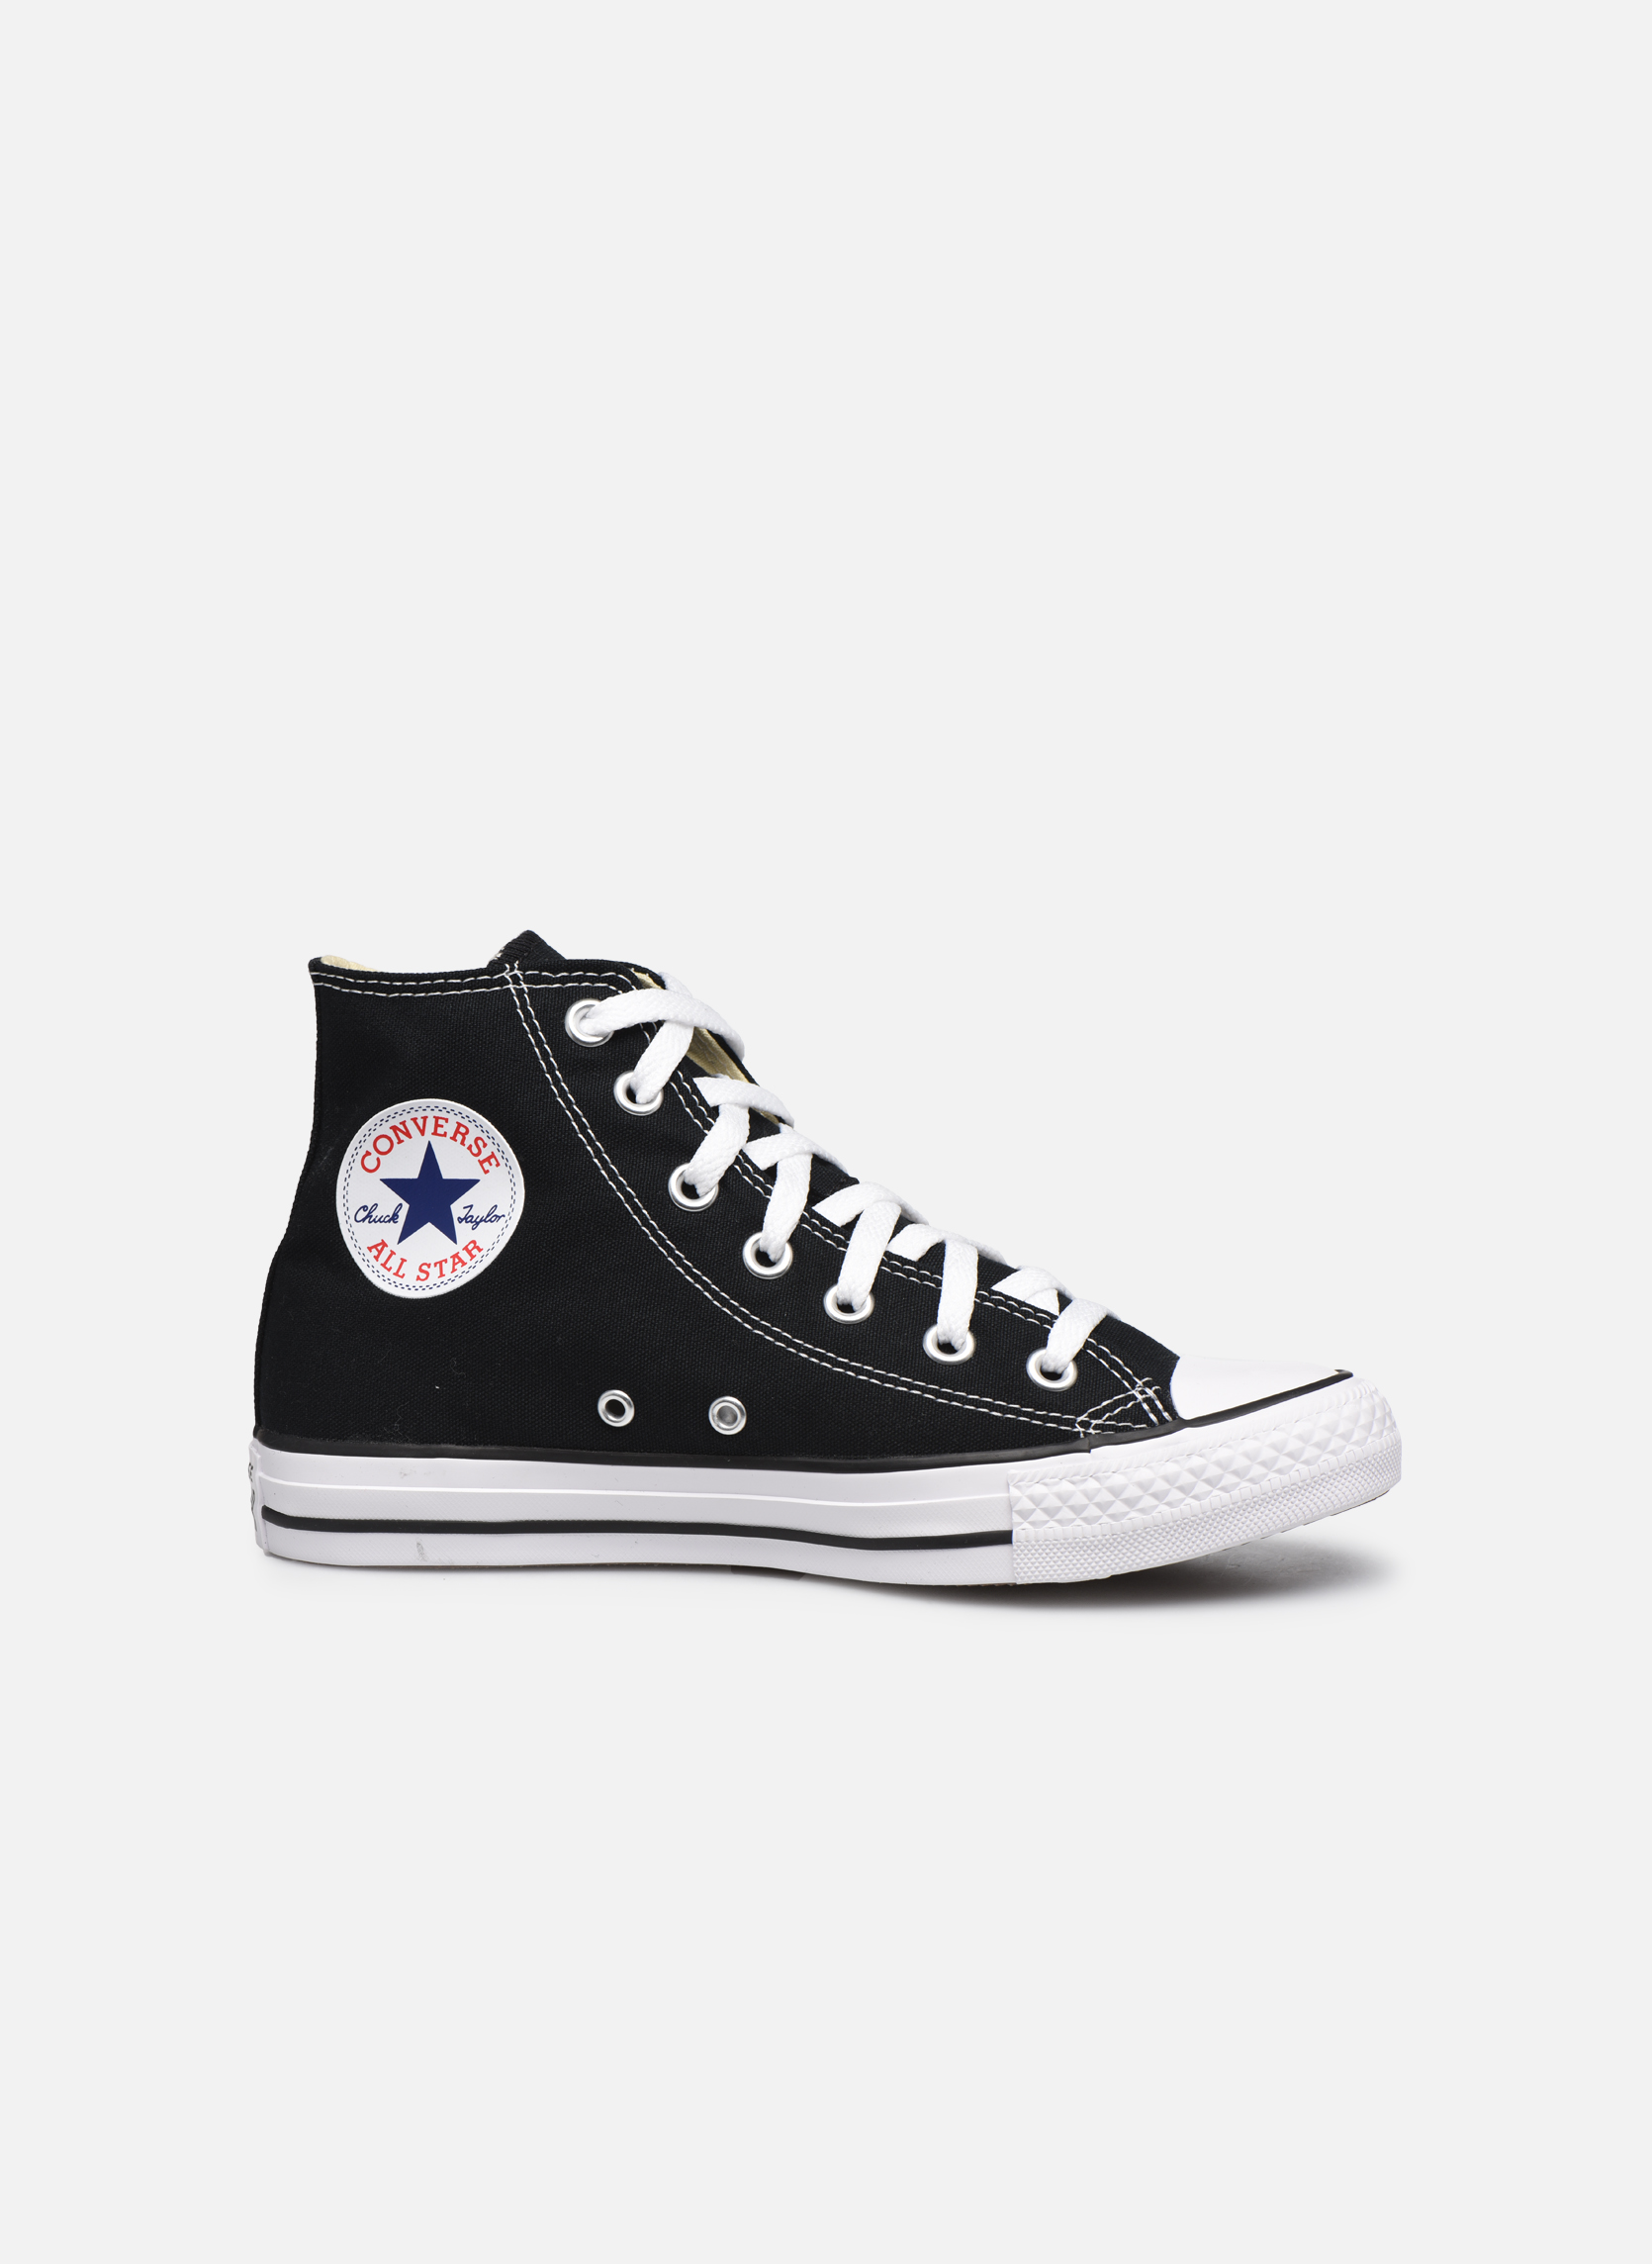 Noir W Converse Hi Taylor All Chuck Star q8YTw